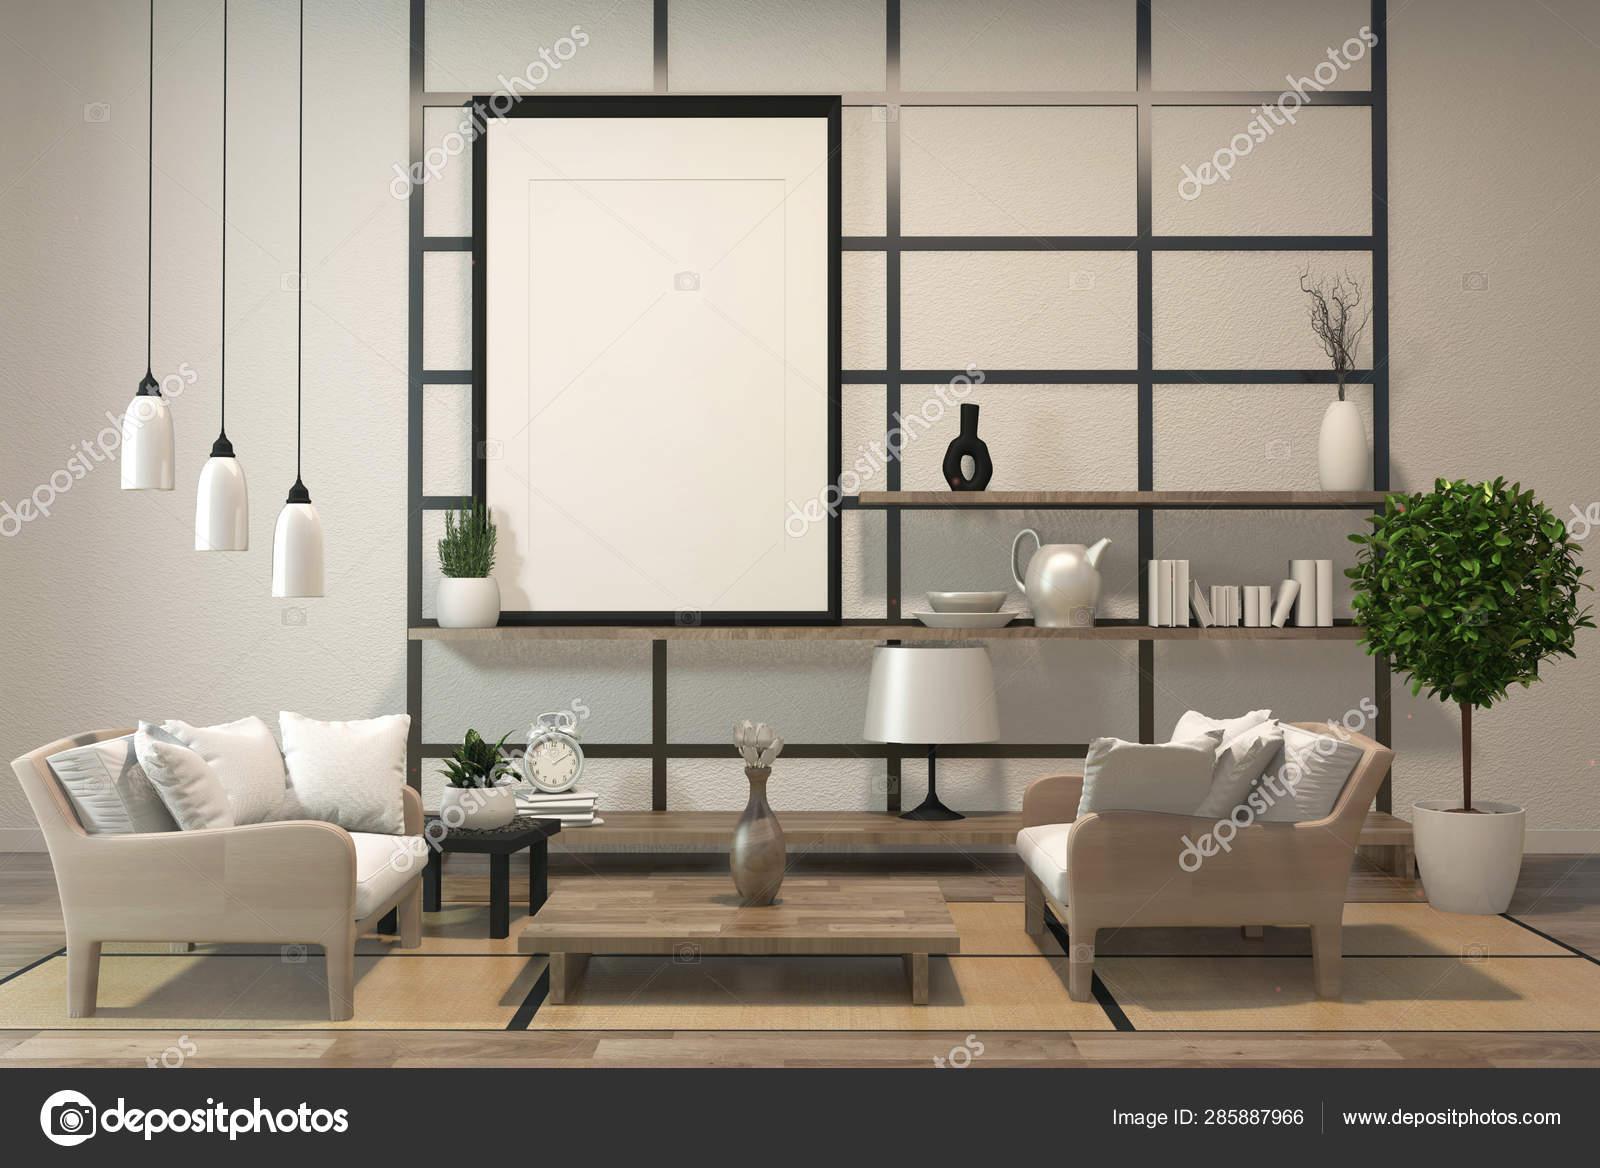 Minimalist Modern Zen Living Room With Wood Floor And Decor Japa Stock Photo C Minny0012011 Gmail Com 285887966